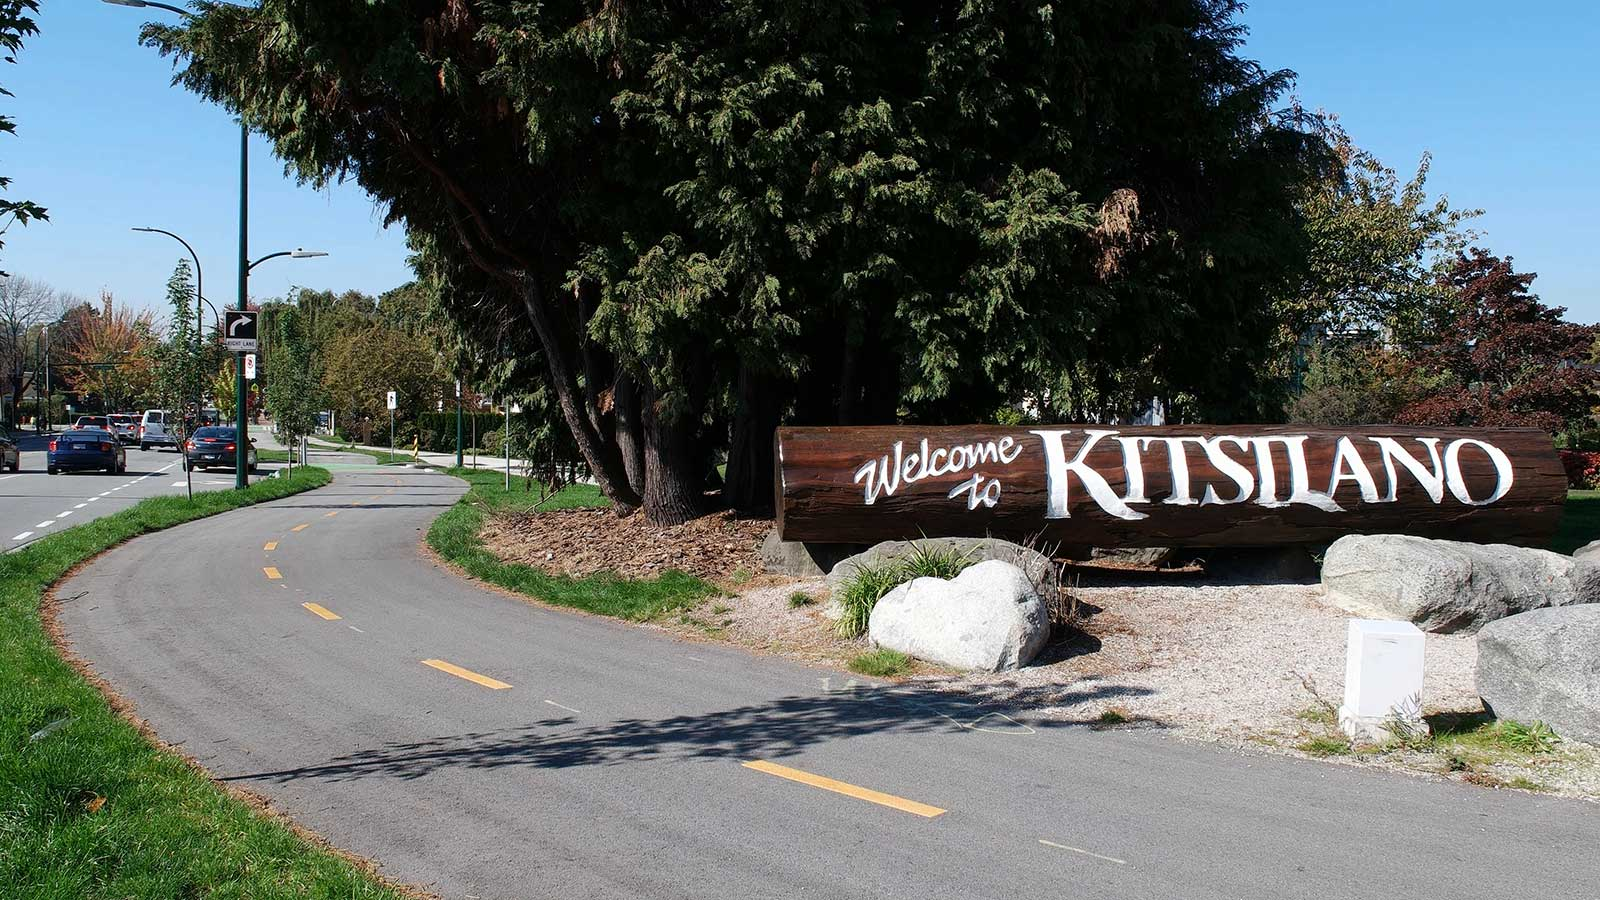 Kitsilano, Vancouver BC - Photo by LocalPix.ca